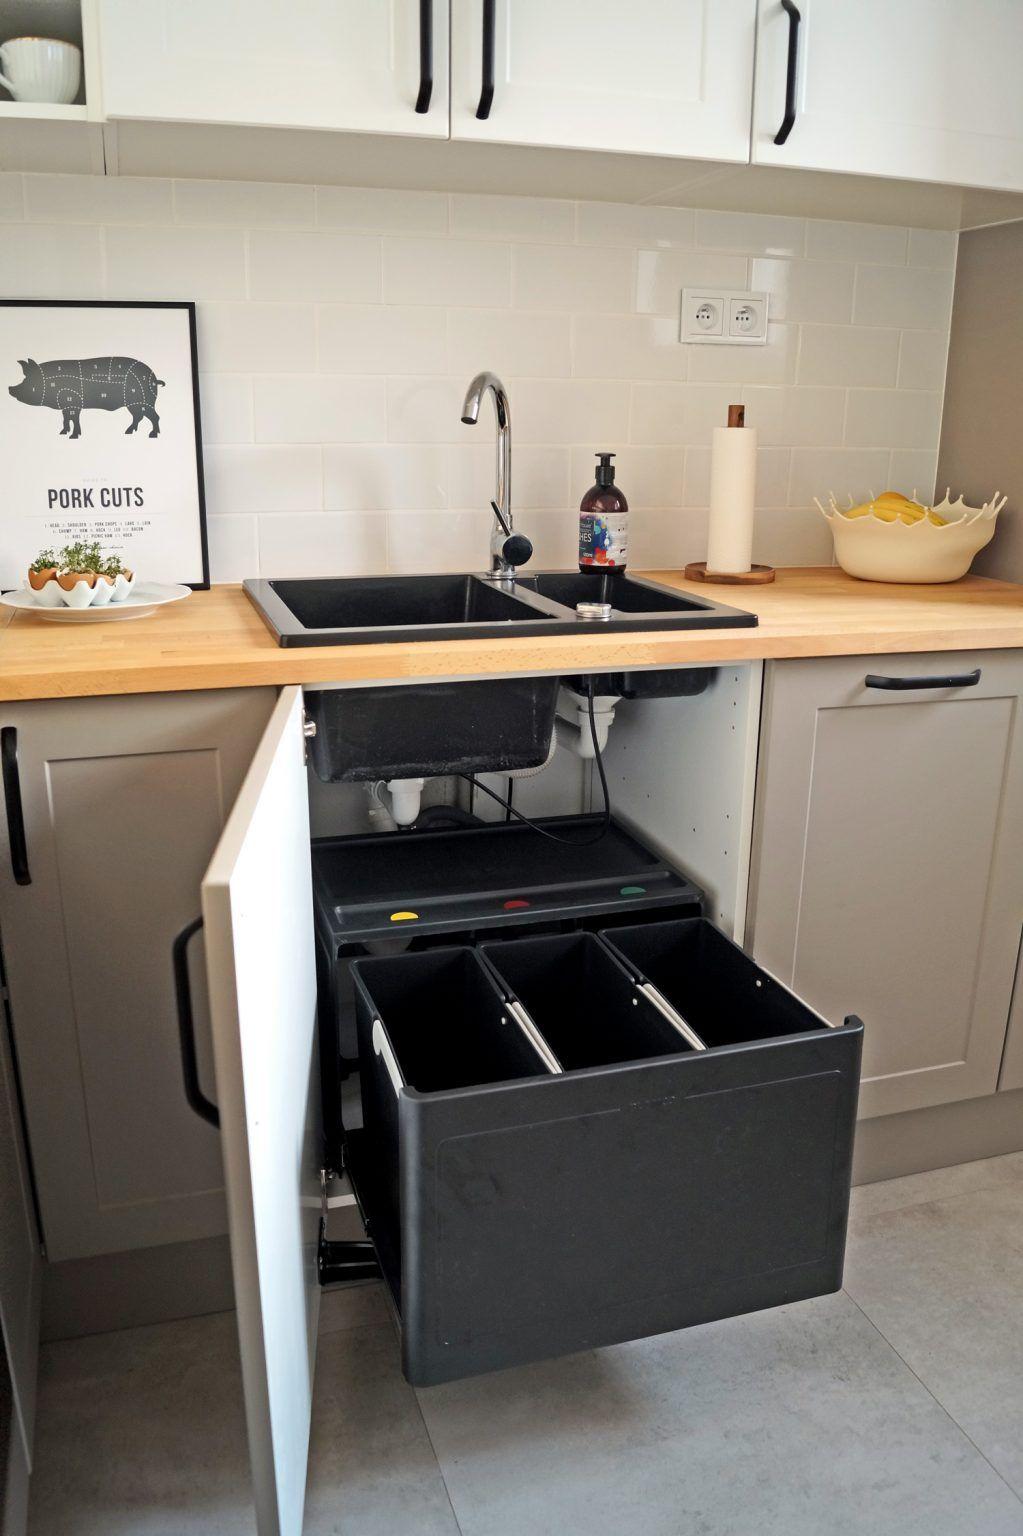 Segregowanie Smieci W Malej Kuchni Learning From Hollywood Kitchen Cabinets Home Decor Decor